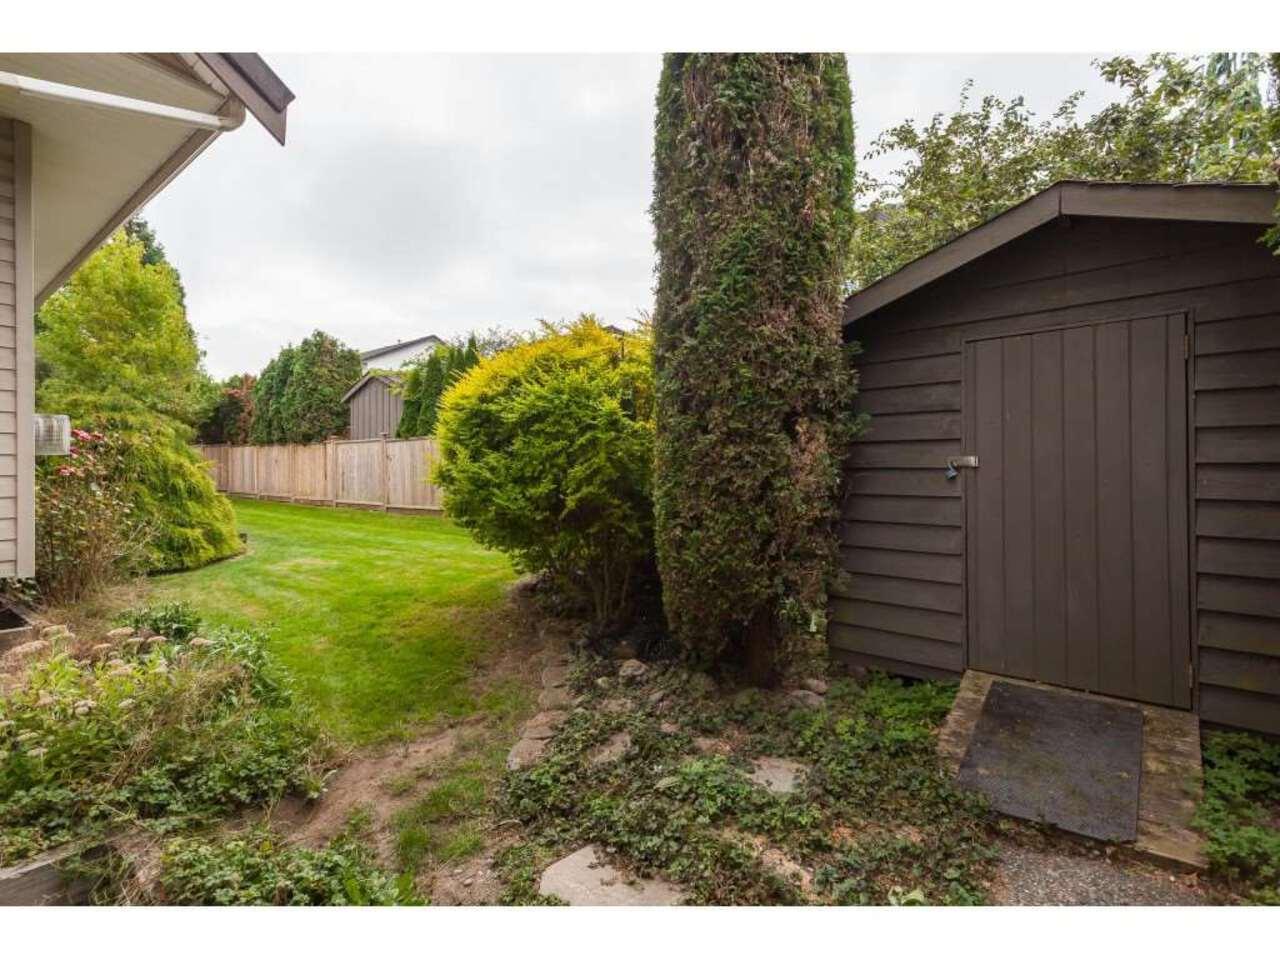 21058-85a-avenue-walnut-grove-langley-40 at 21058 85a Avenue, Walnut Grove, Langley